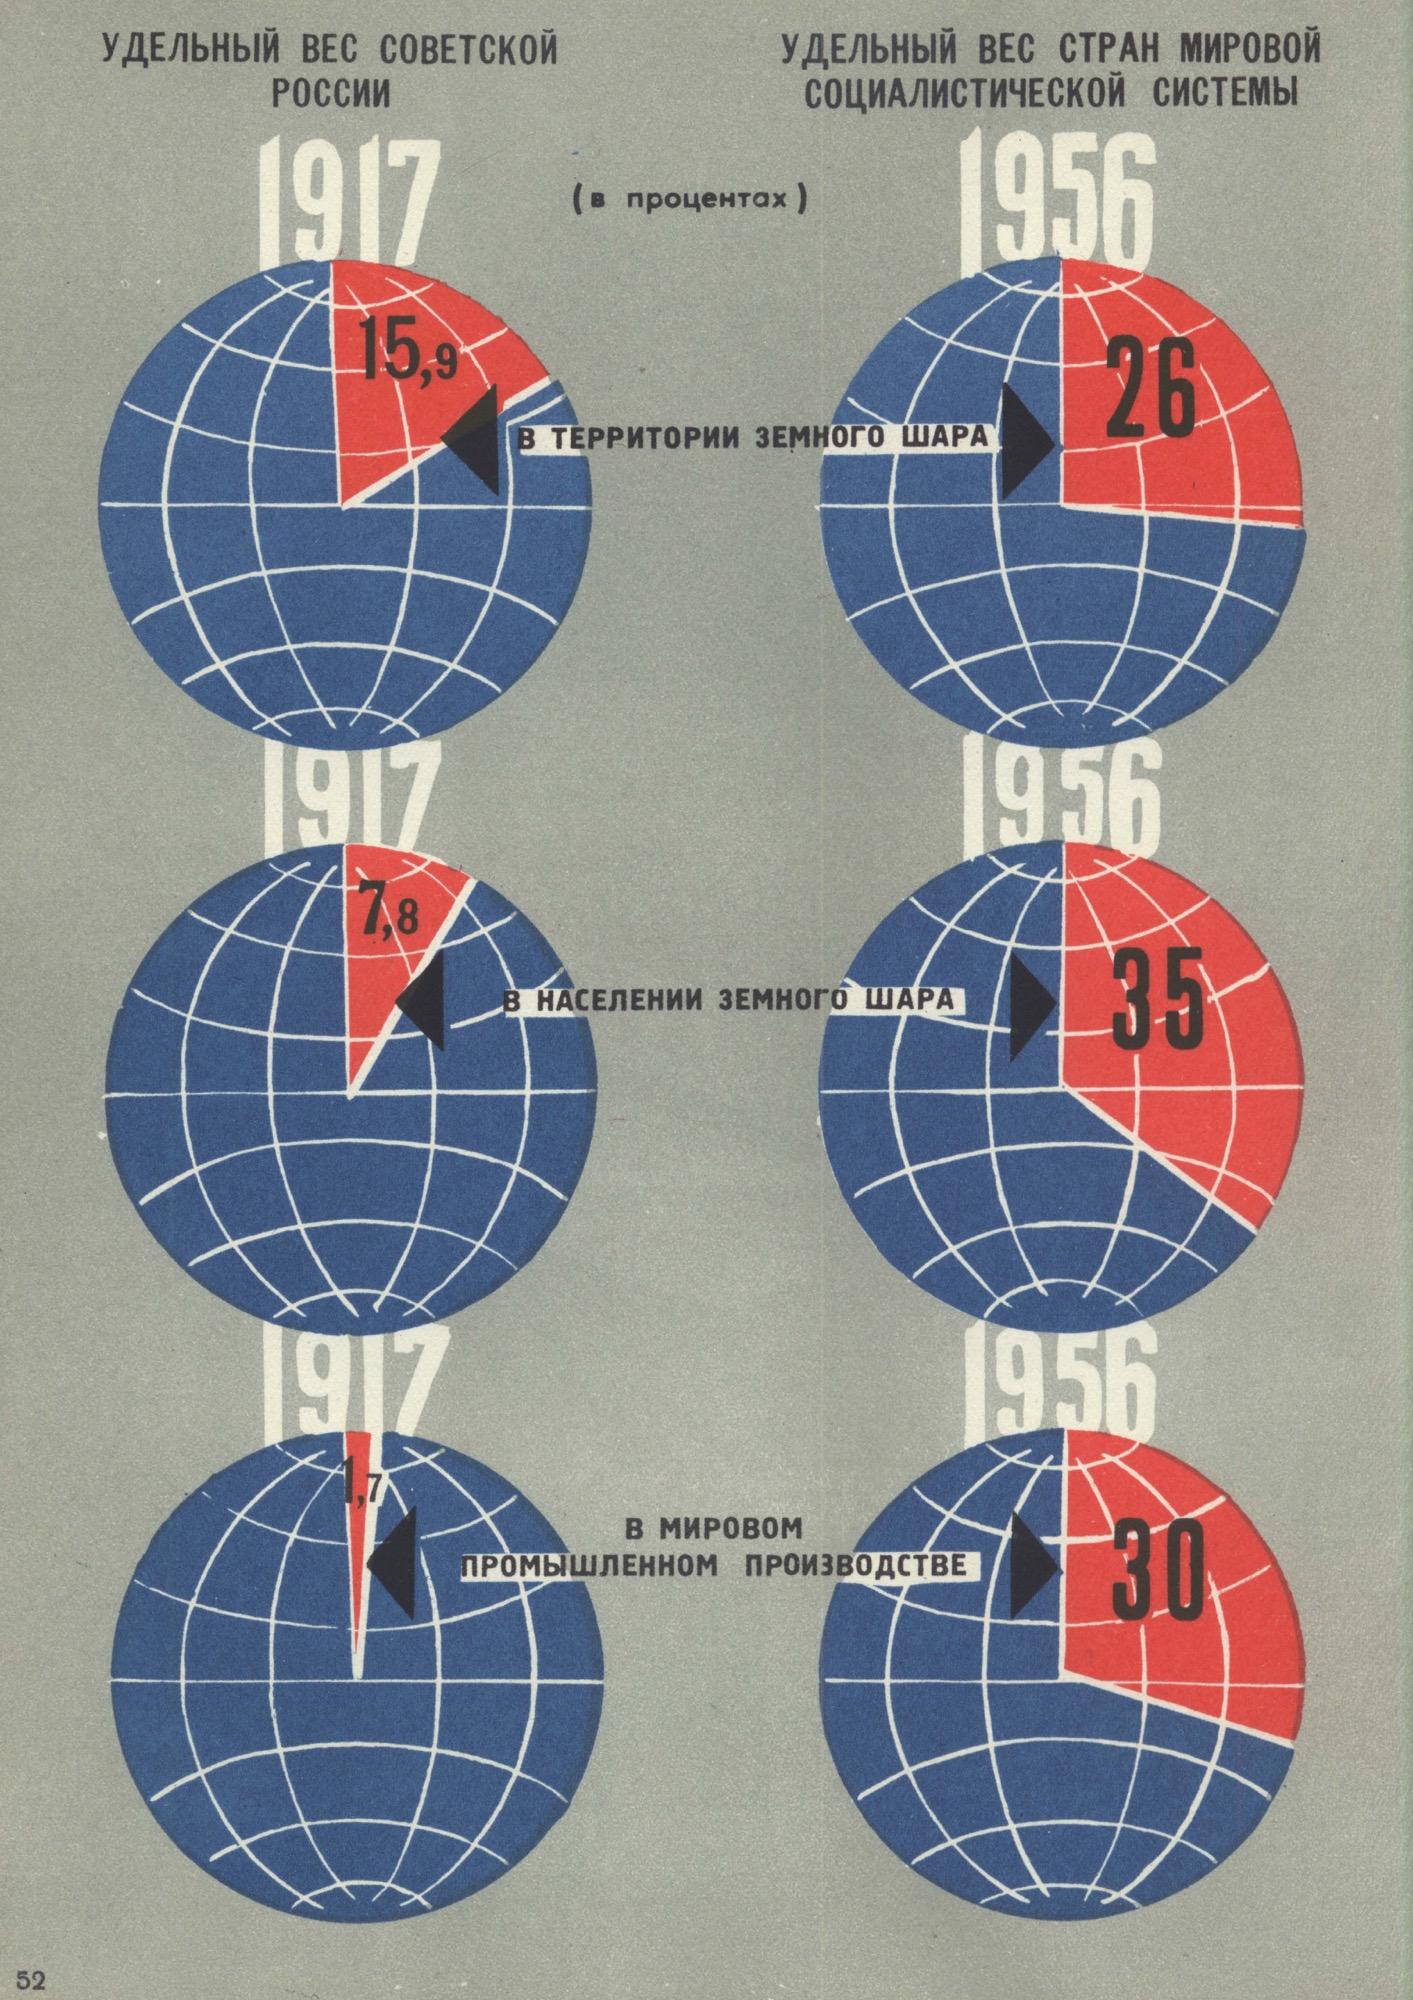 cccp infographics 52 copy